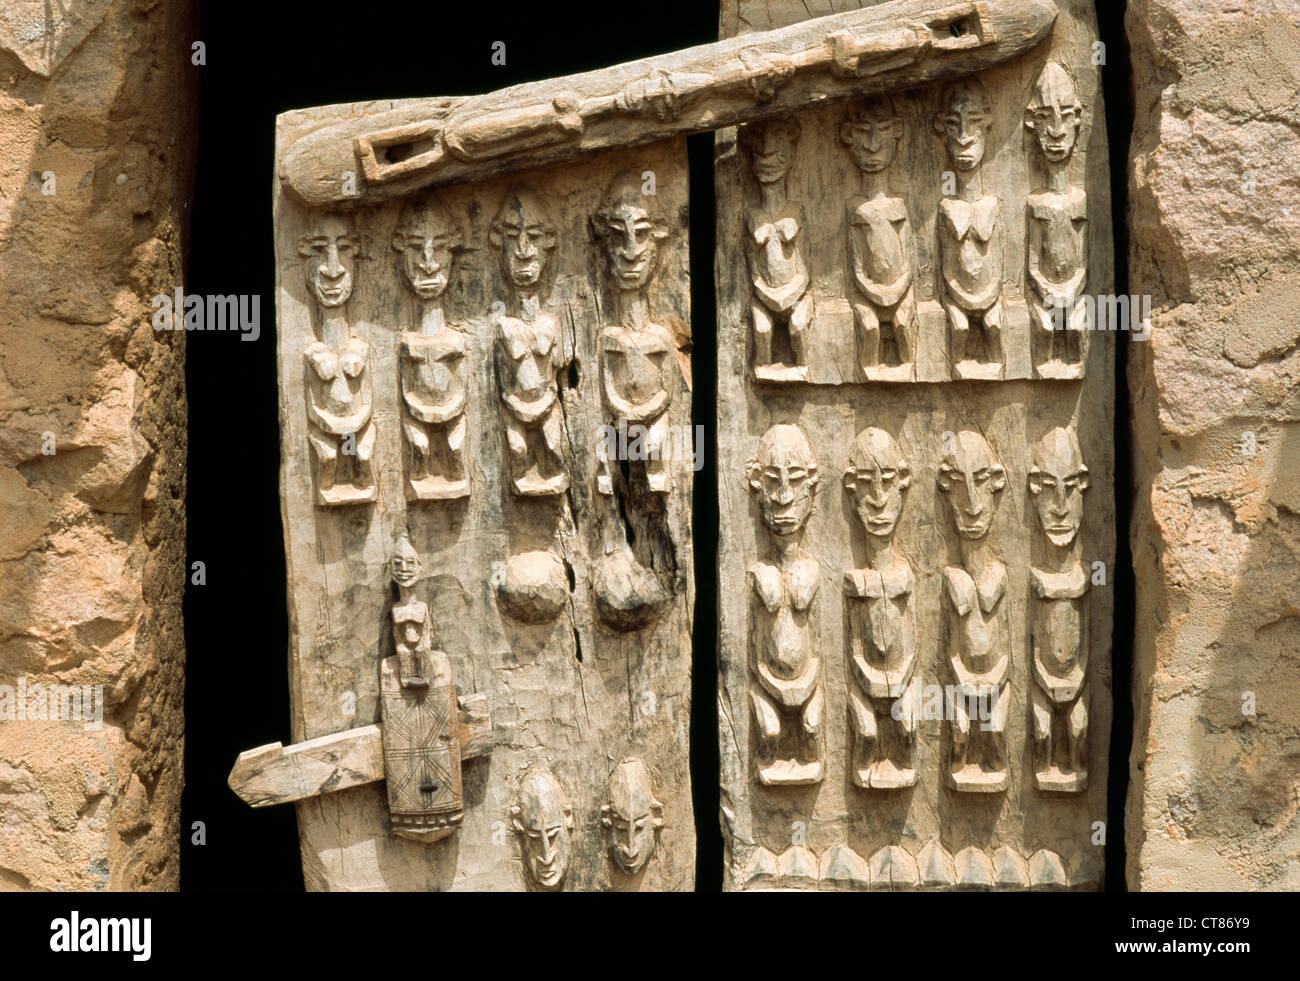 Djiguibombo Dogon country Mali; carved granary door - Stock Image & Dogon Mali Granary Door Carved Stock Photos u0026 Dogon Mali Granary ...